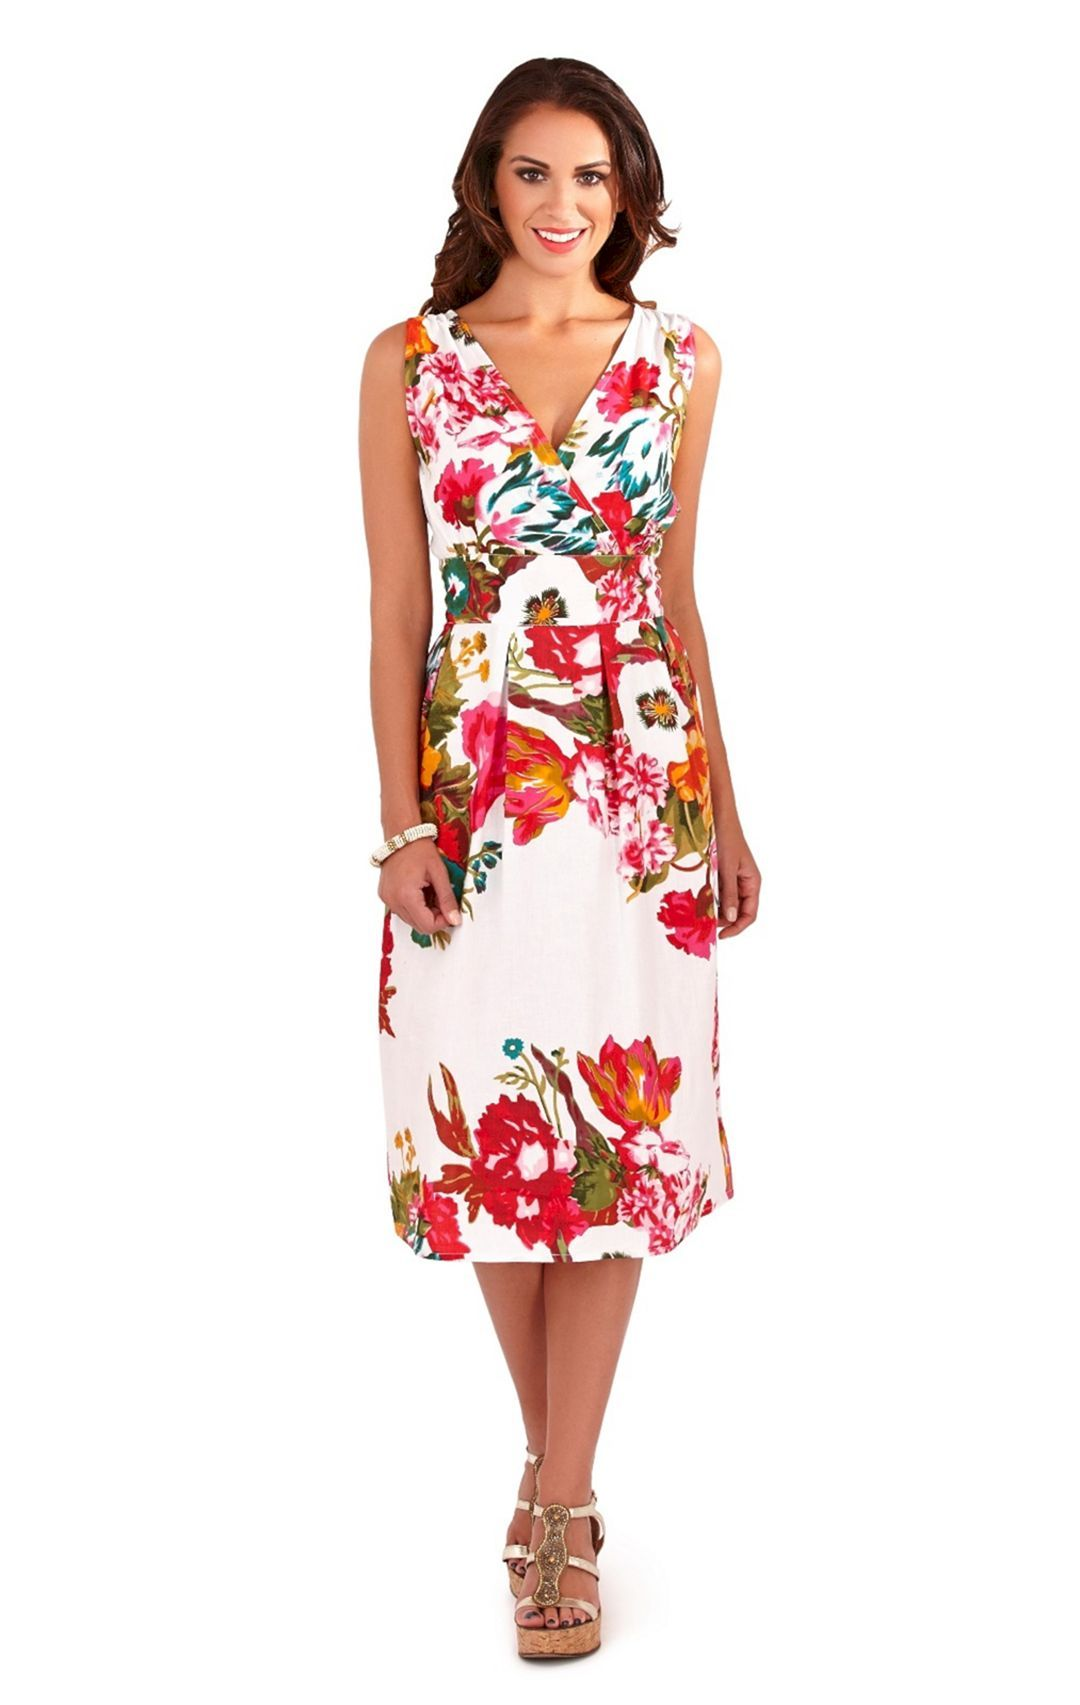 25 Lovely Women Floral Dress For Summer Fashion Ideas Womens Floral Dress Holiday Dresses Women Cotton Dress Summer [ 1705 x 1080 Pixel ]